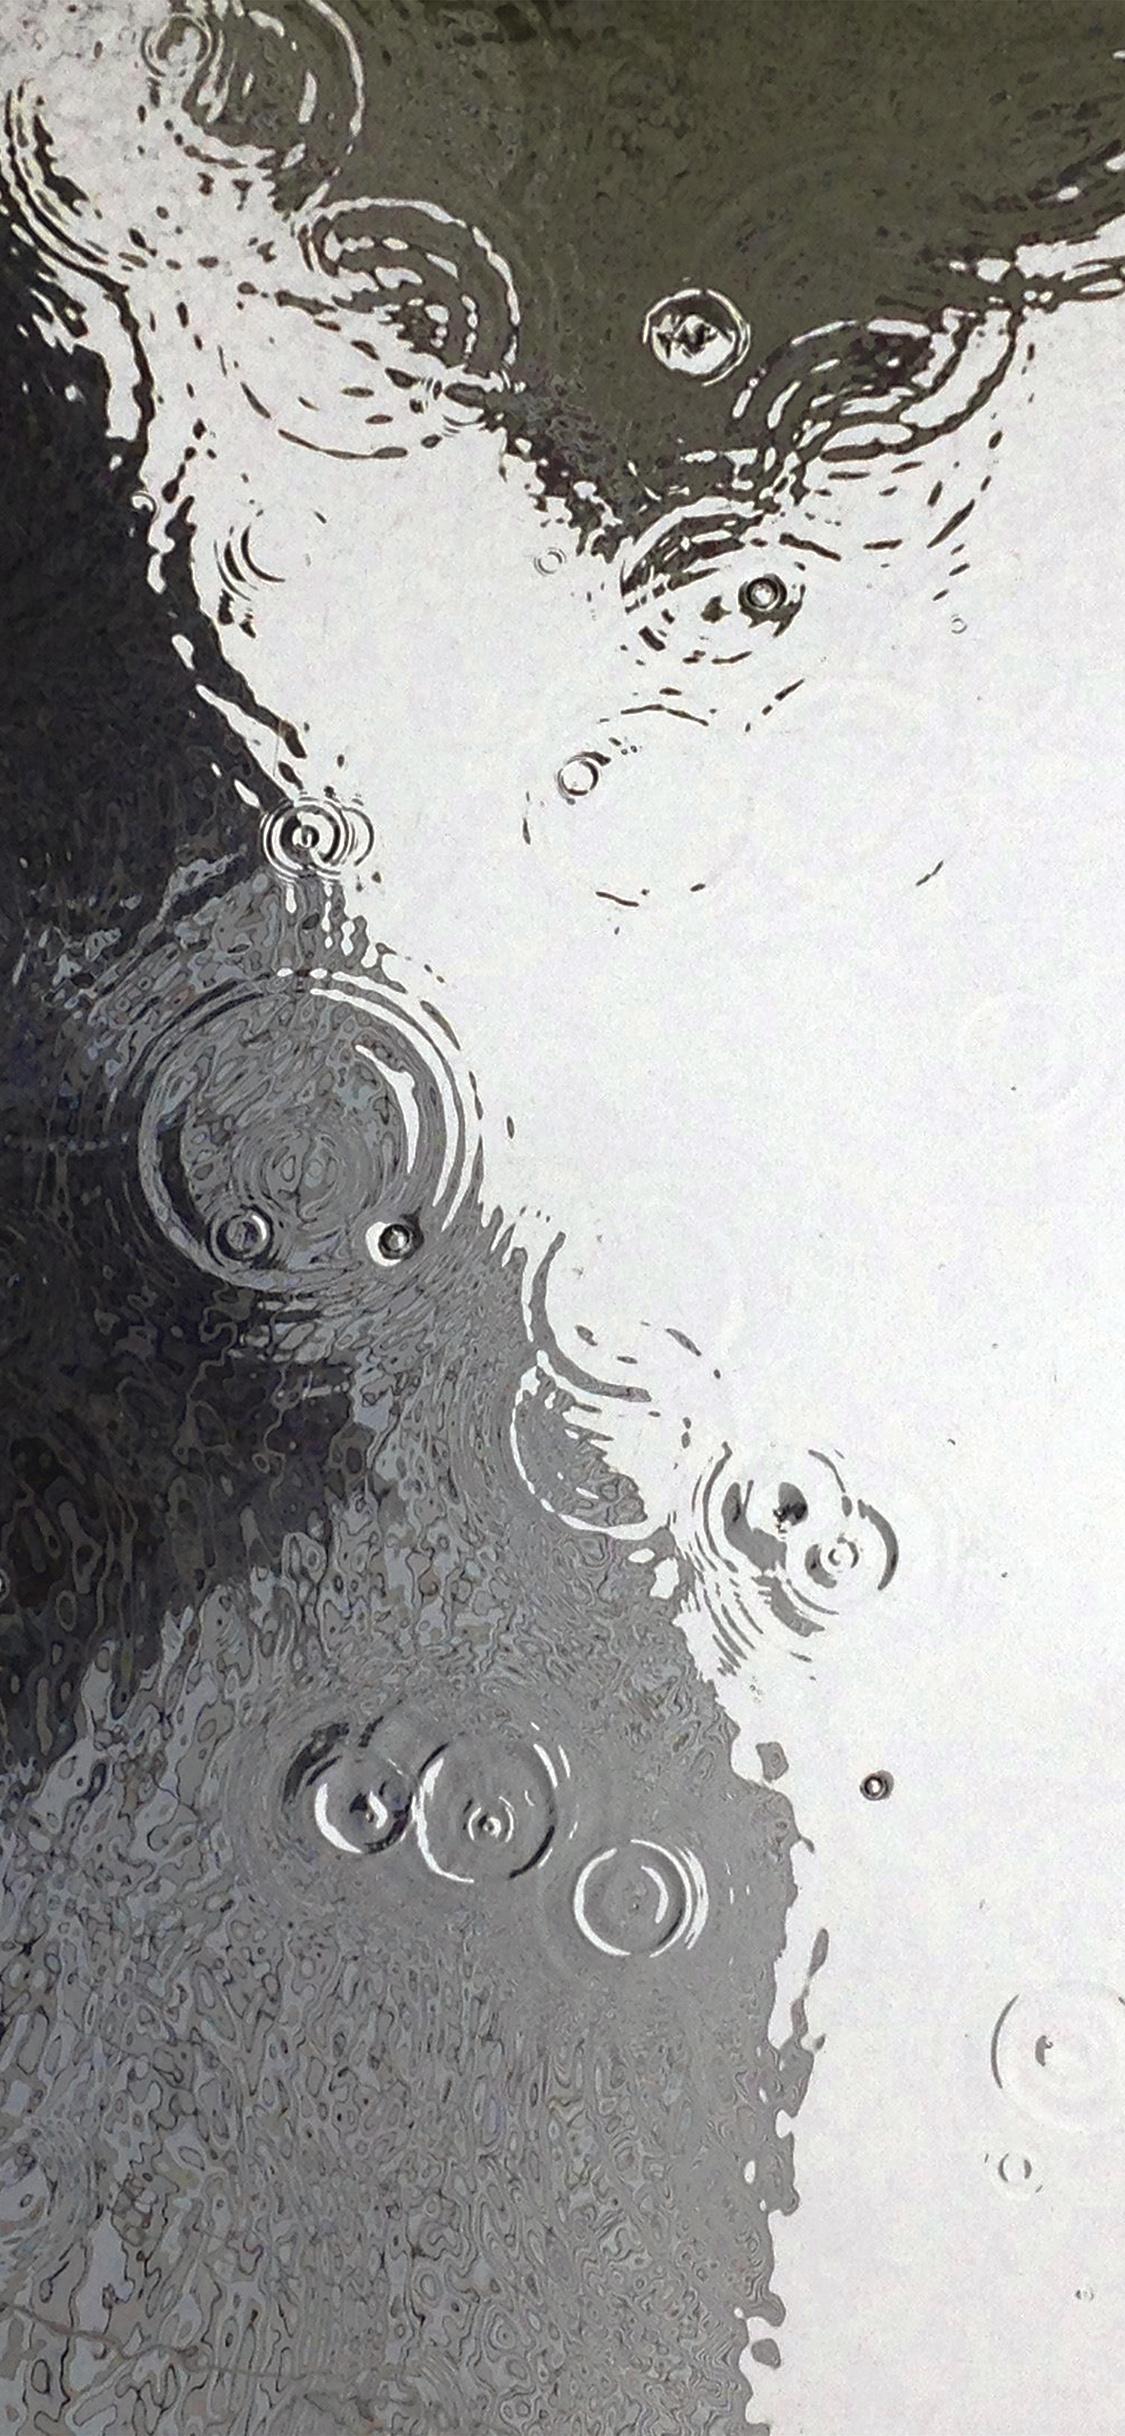 iPhonexpapers.com-Apple-iPhone-wallpaper-ni05-raindrop-day-city-bokeh-nature-pattern-circle